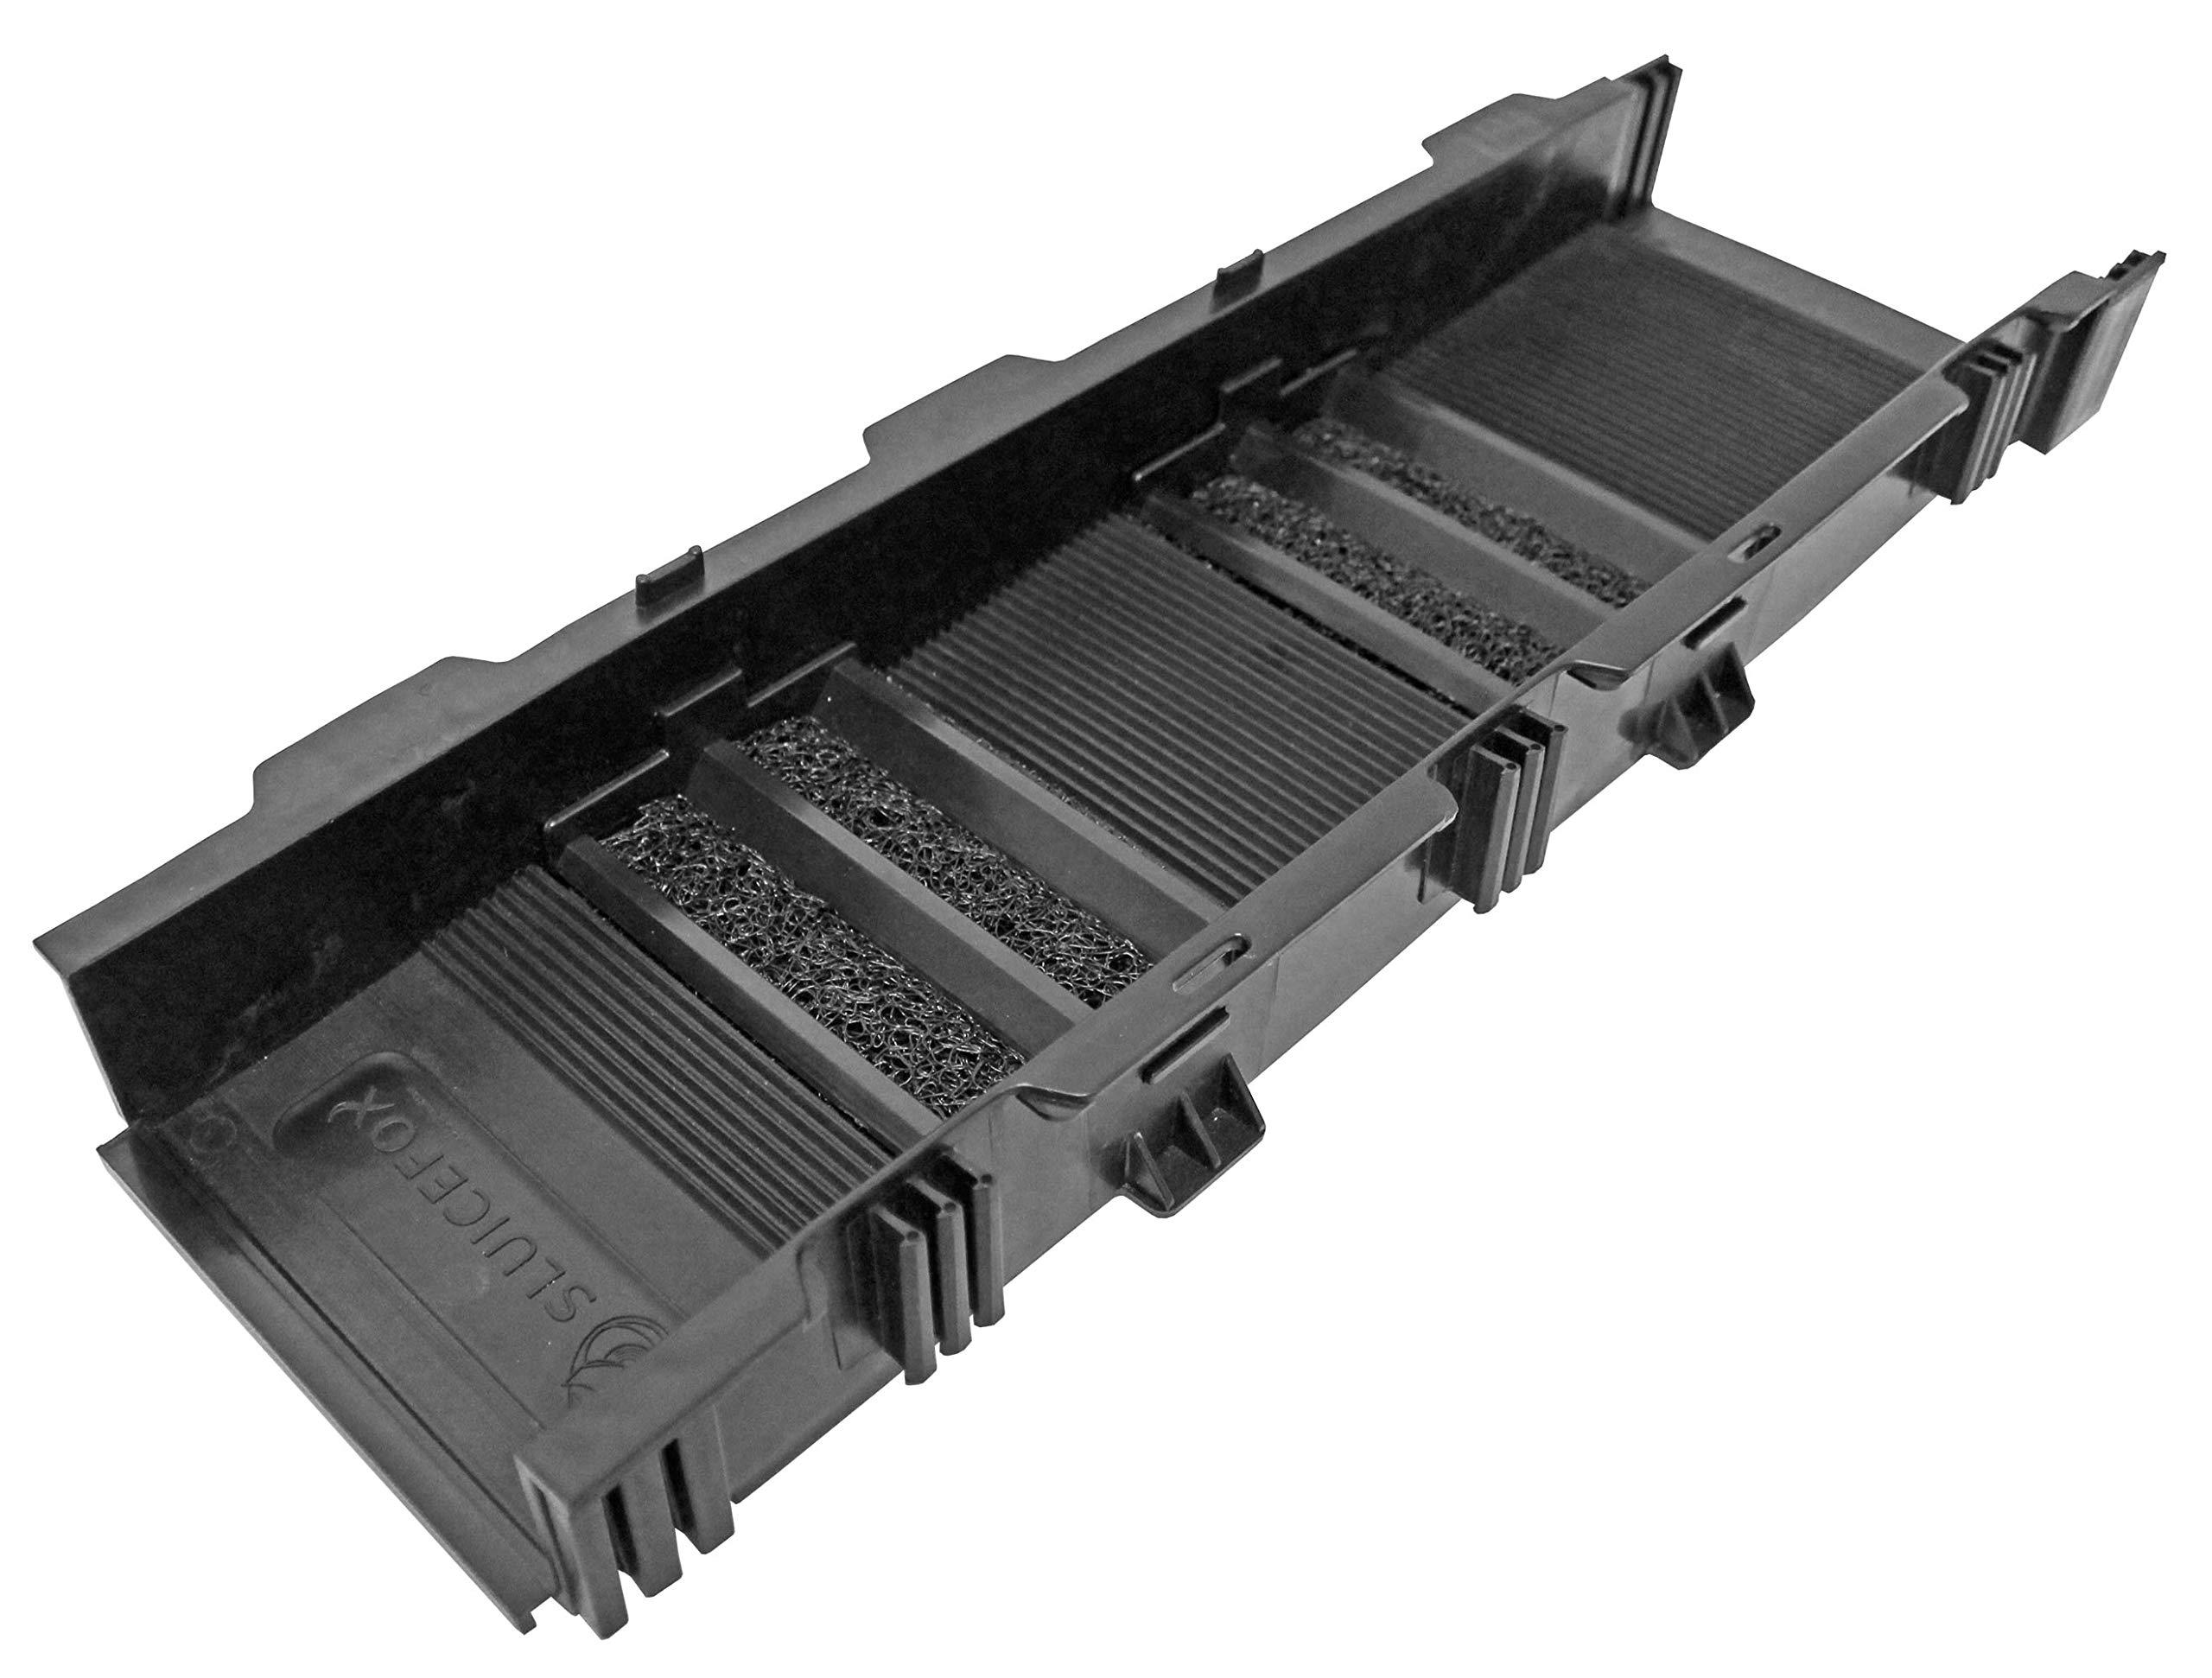 Sluice Fox 24'' Portable Modular Sluice Box Black Dredging Gold Panning Sluicing